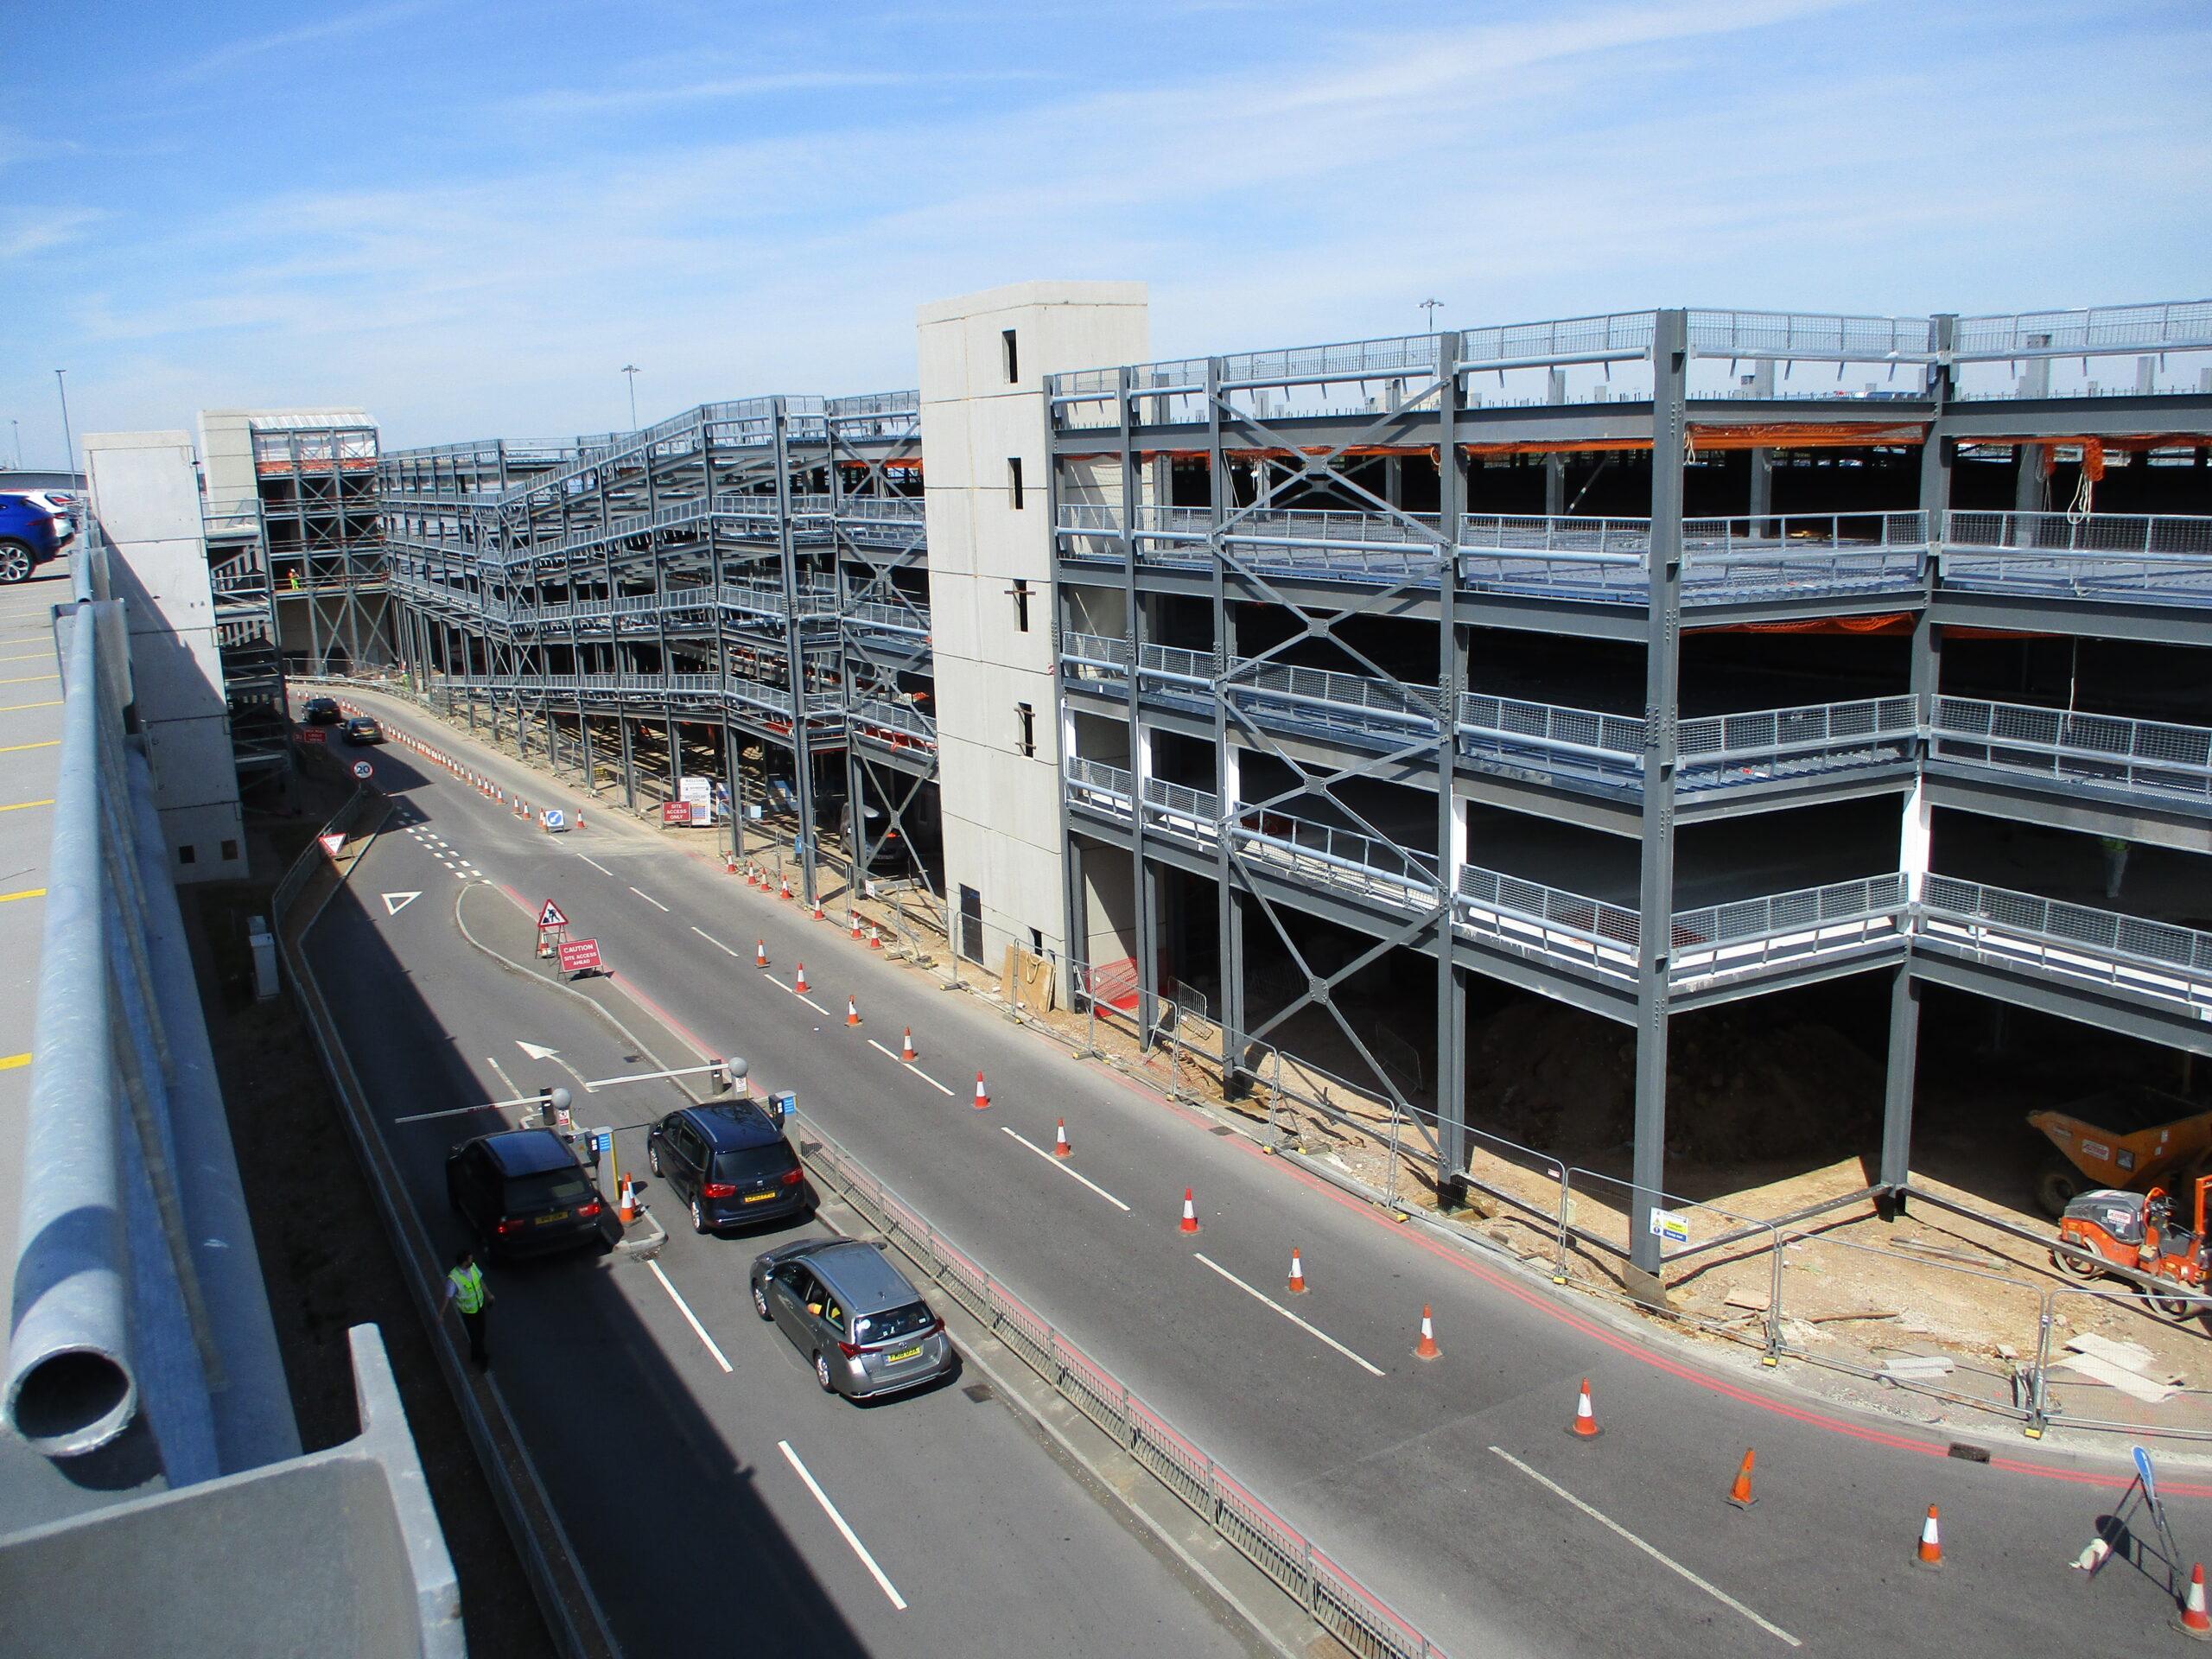 London Luton Airport Carpark